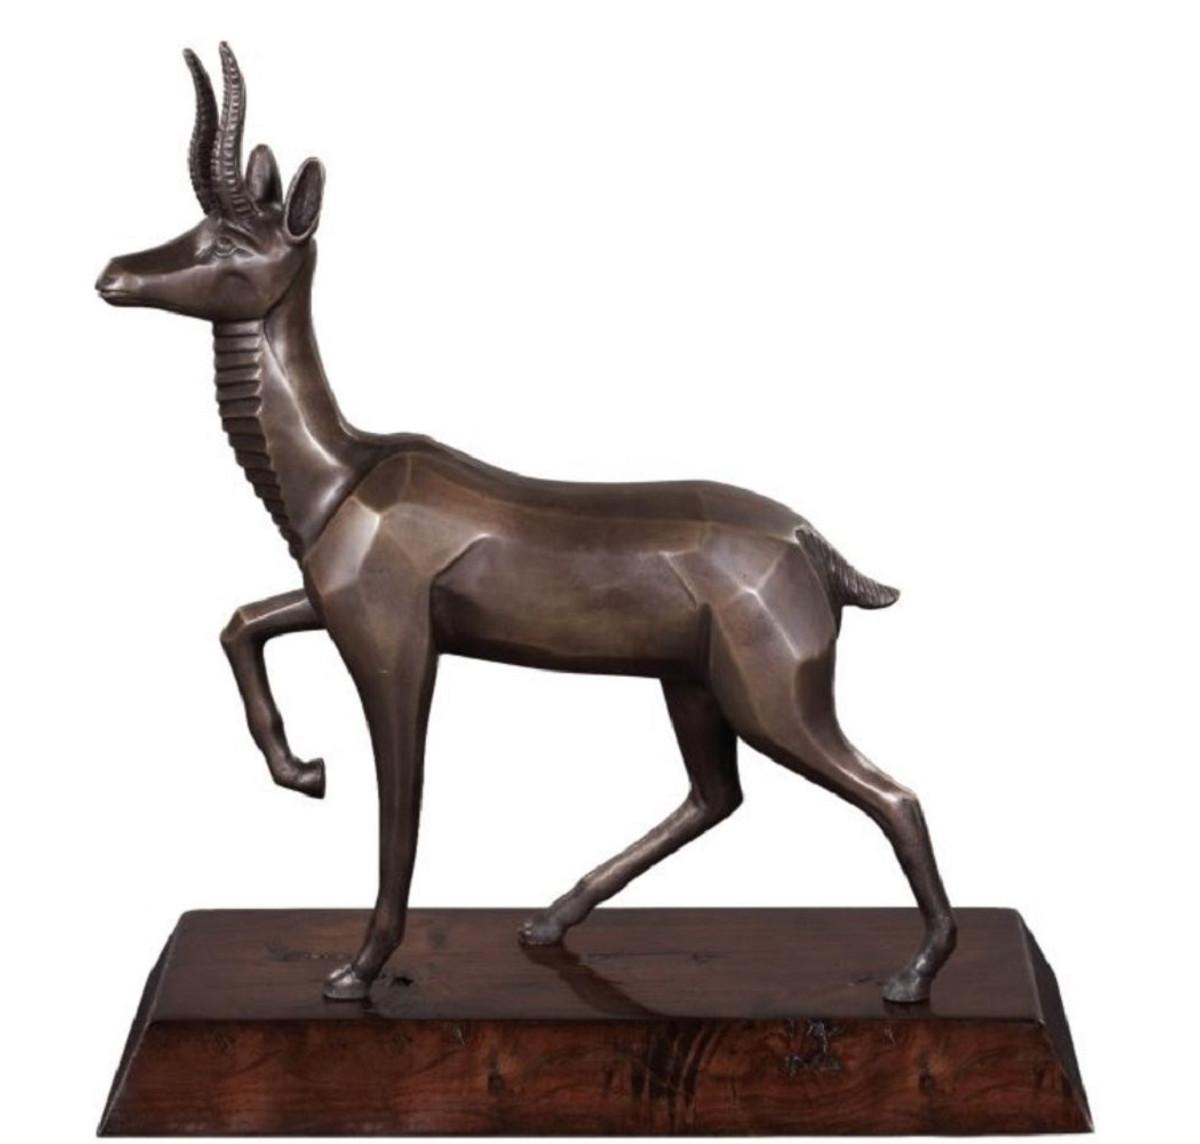 Casa Padrino Luxus Bronzefigur Antilope Bronze / Dunkelbraun 35 x 17 x H. 37 cm - Dekofigur mit Holzsockel  2